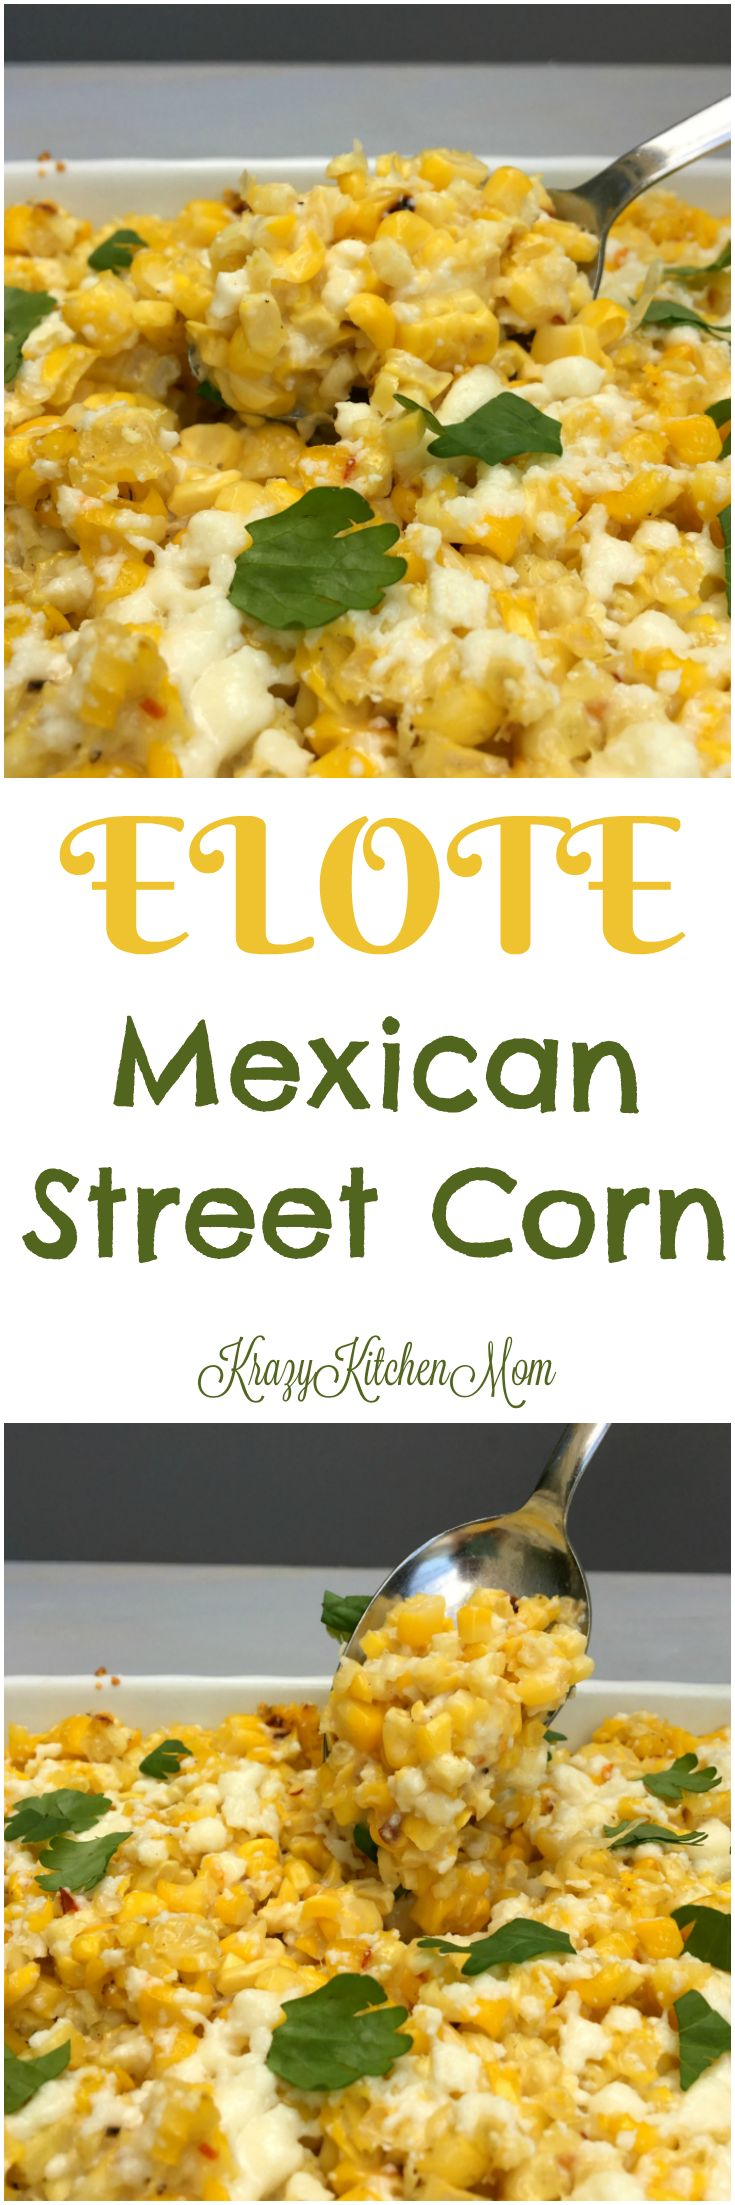 Elote - Mexican Street Corn